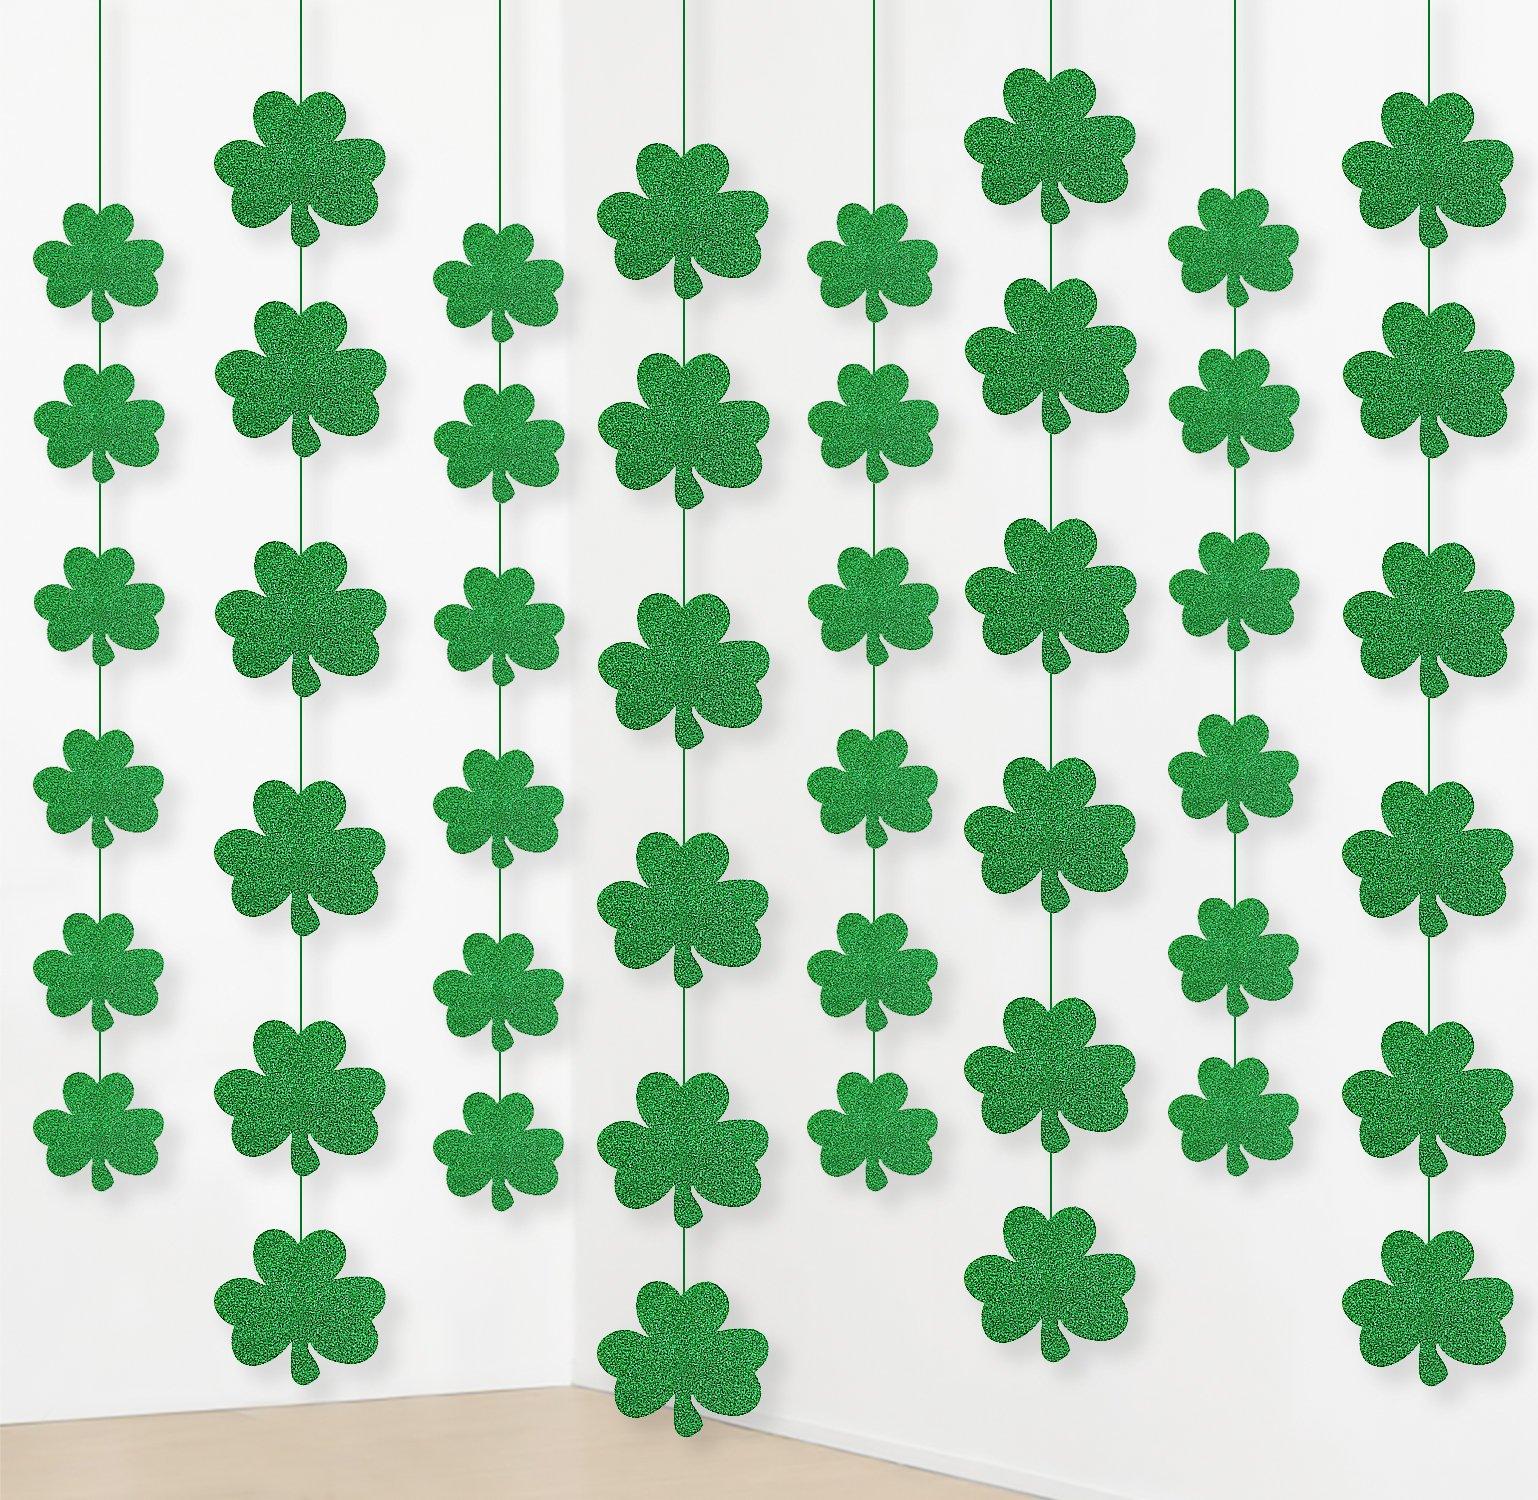 silk flower arrangements jollylife 12pcs st. patrick's day shamrock decorations - lucky irish party hanging ornaments garland cutouts